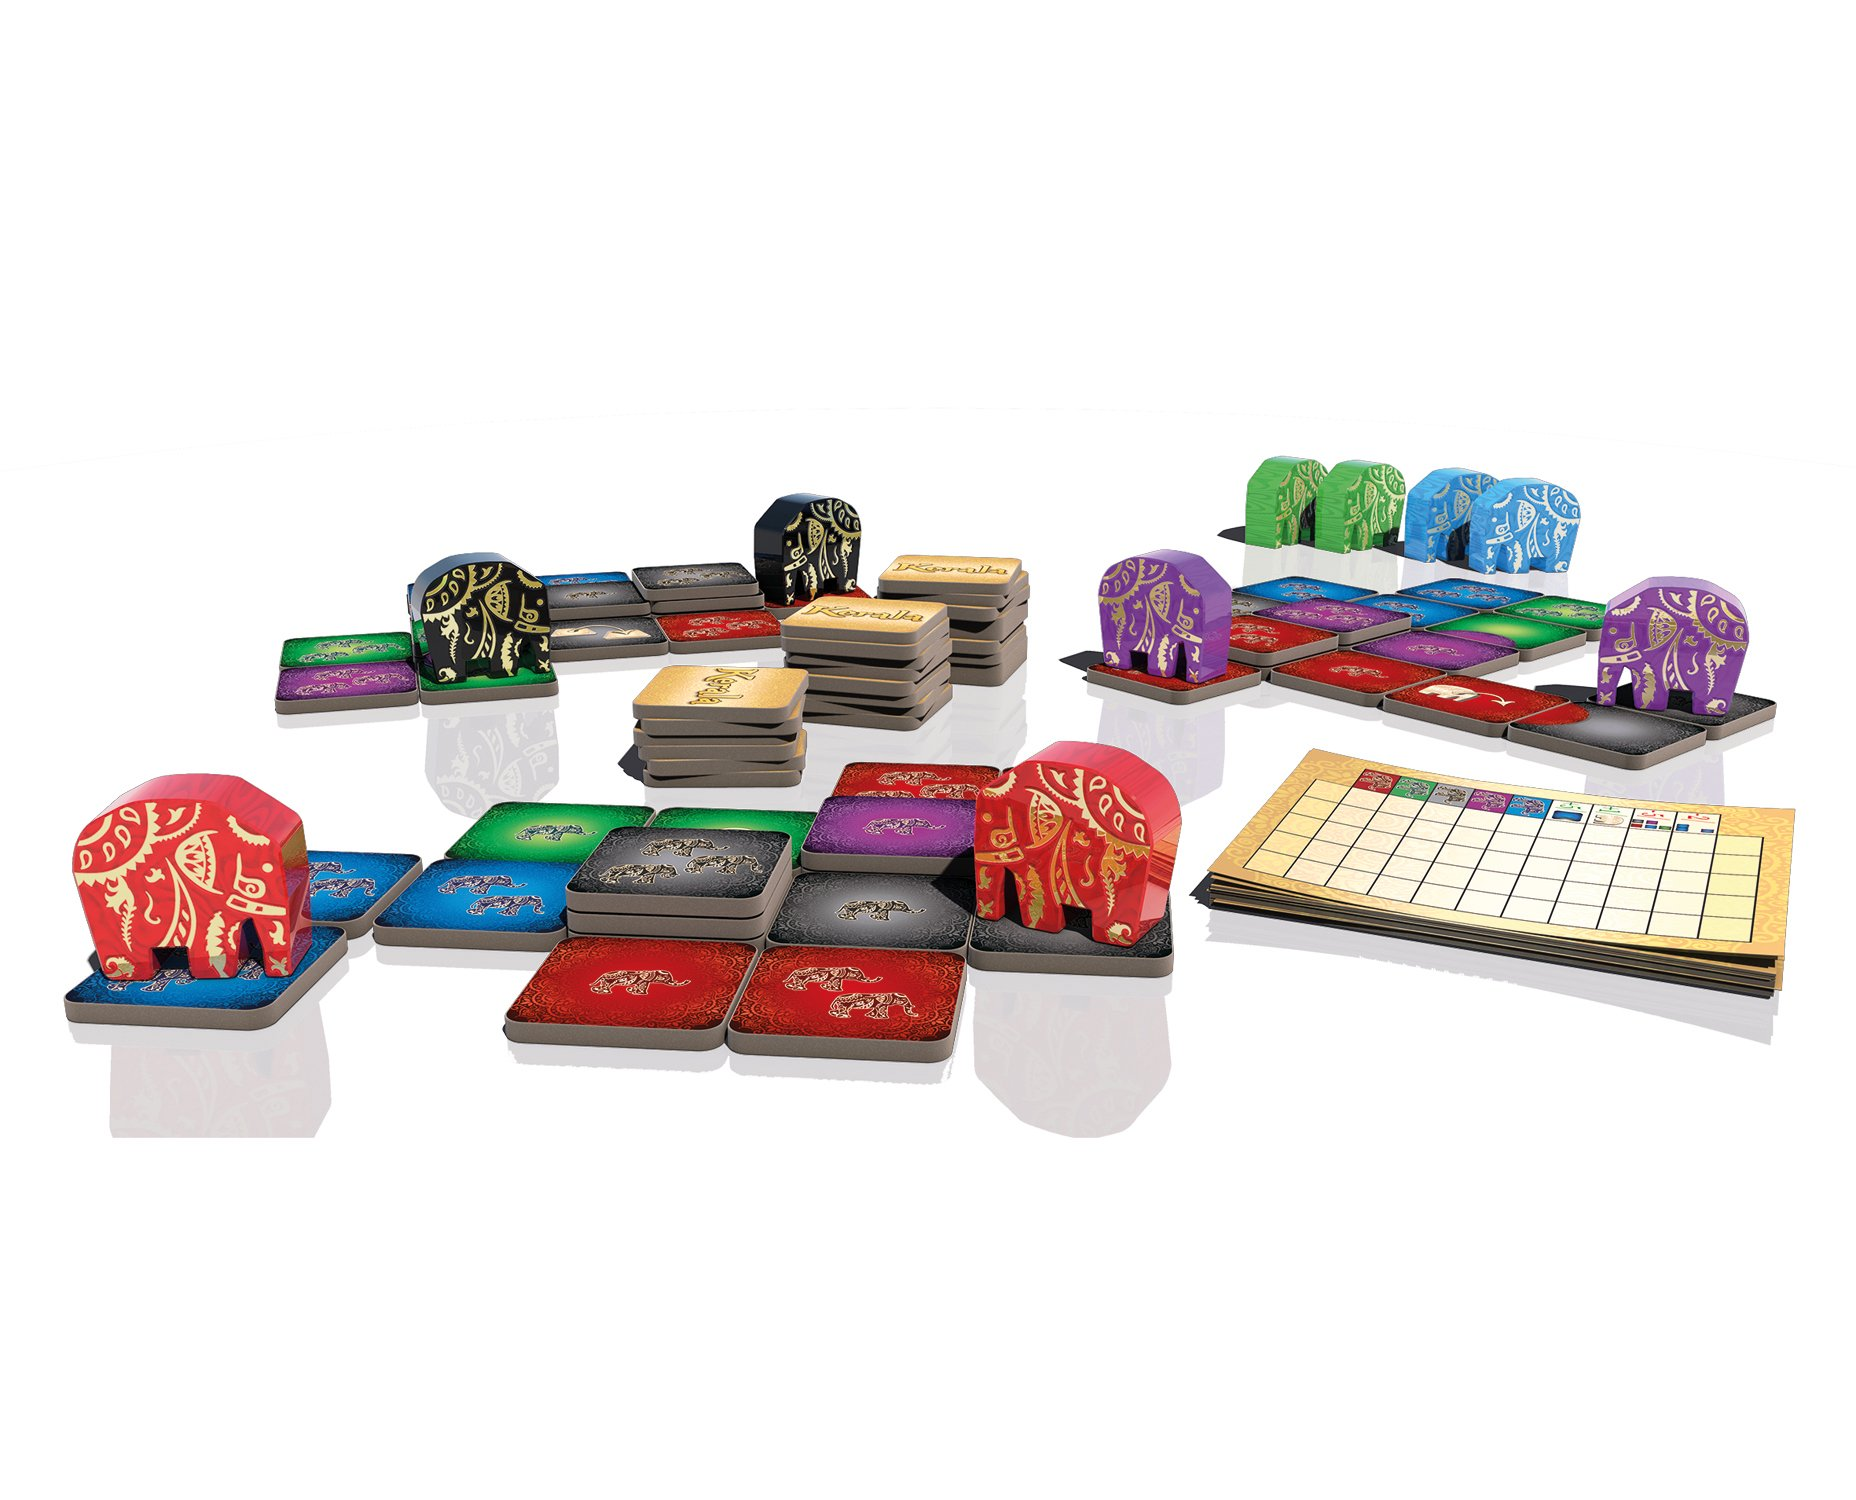 KOSMOS-Spiele-692469-Familienspiel-x